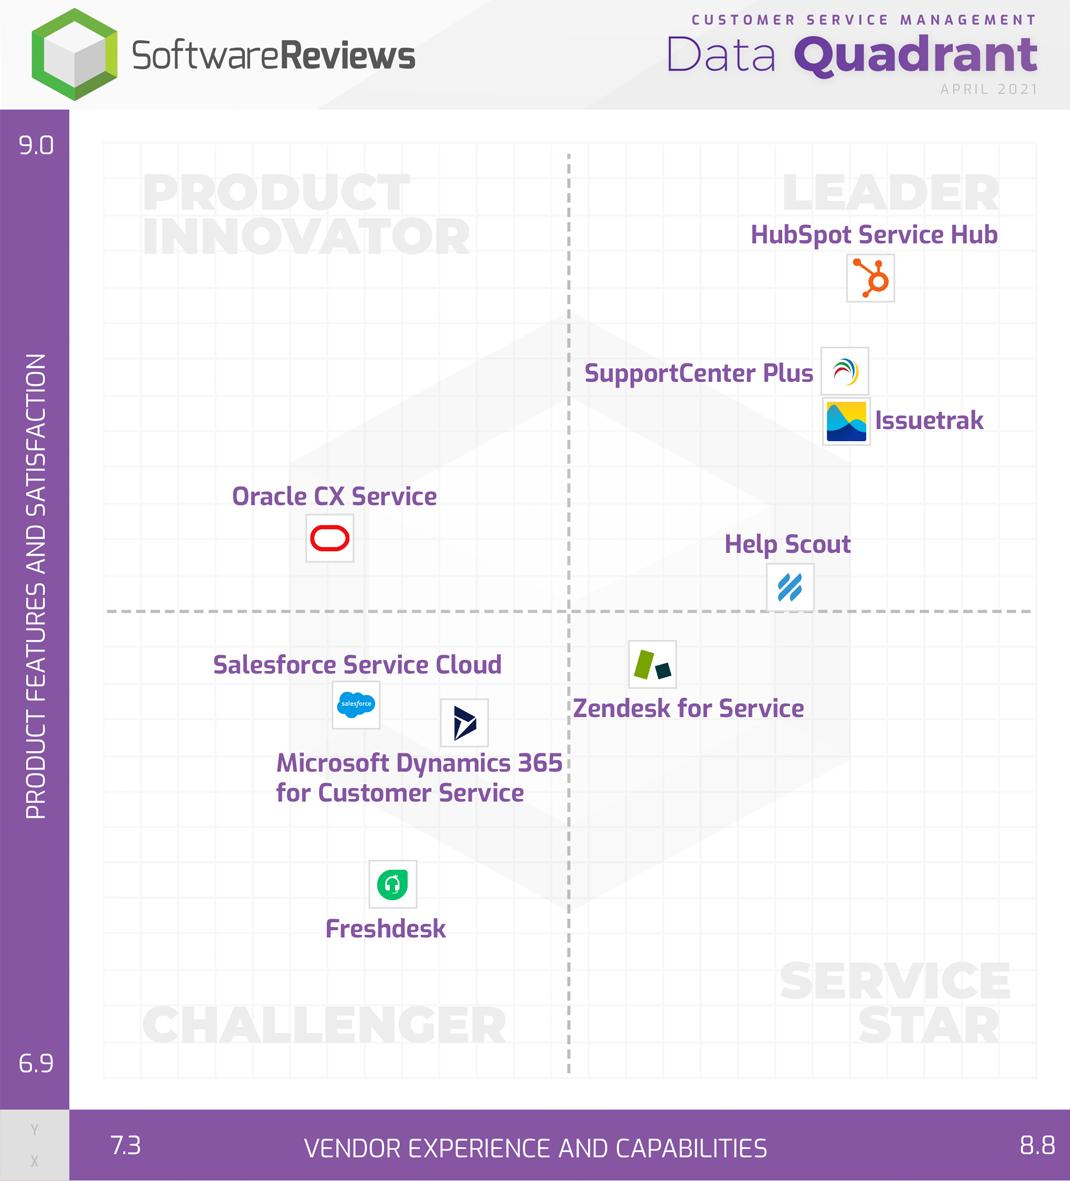 SoftwareReviews - Data Quadrant